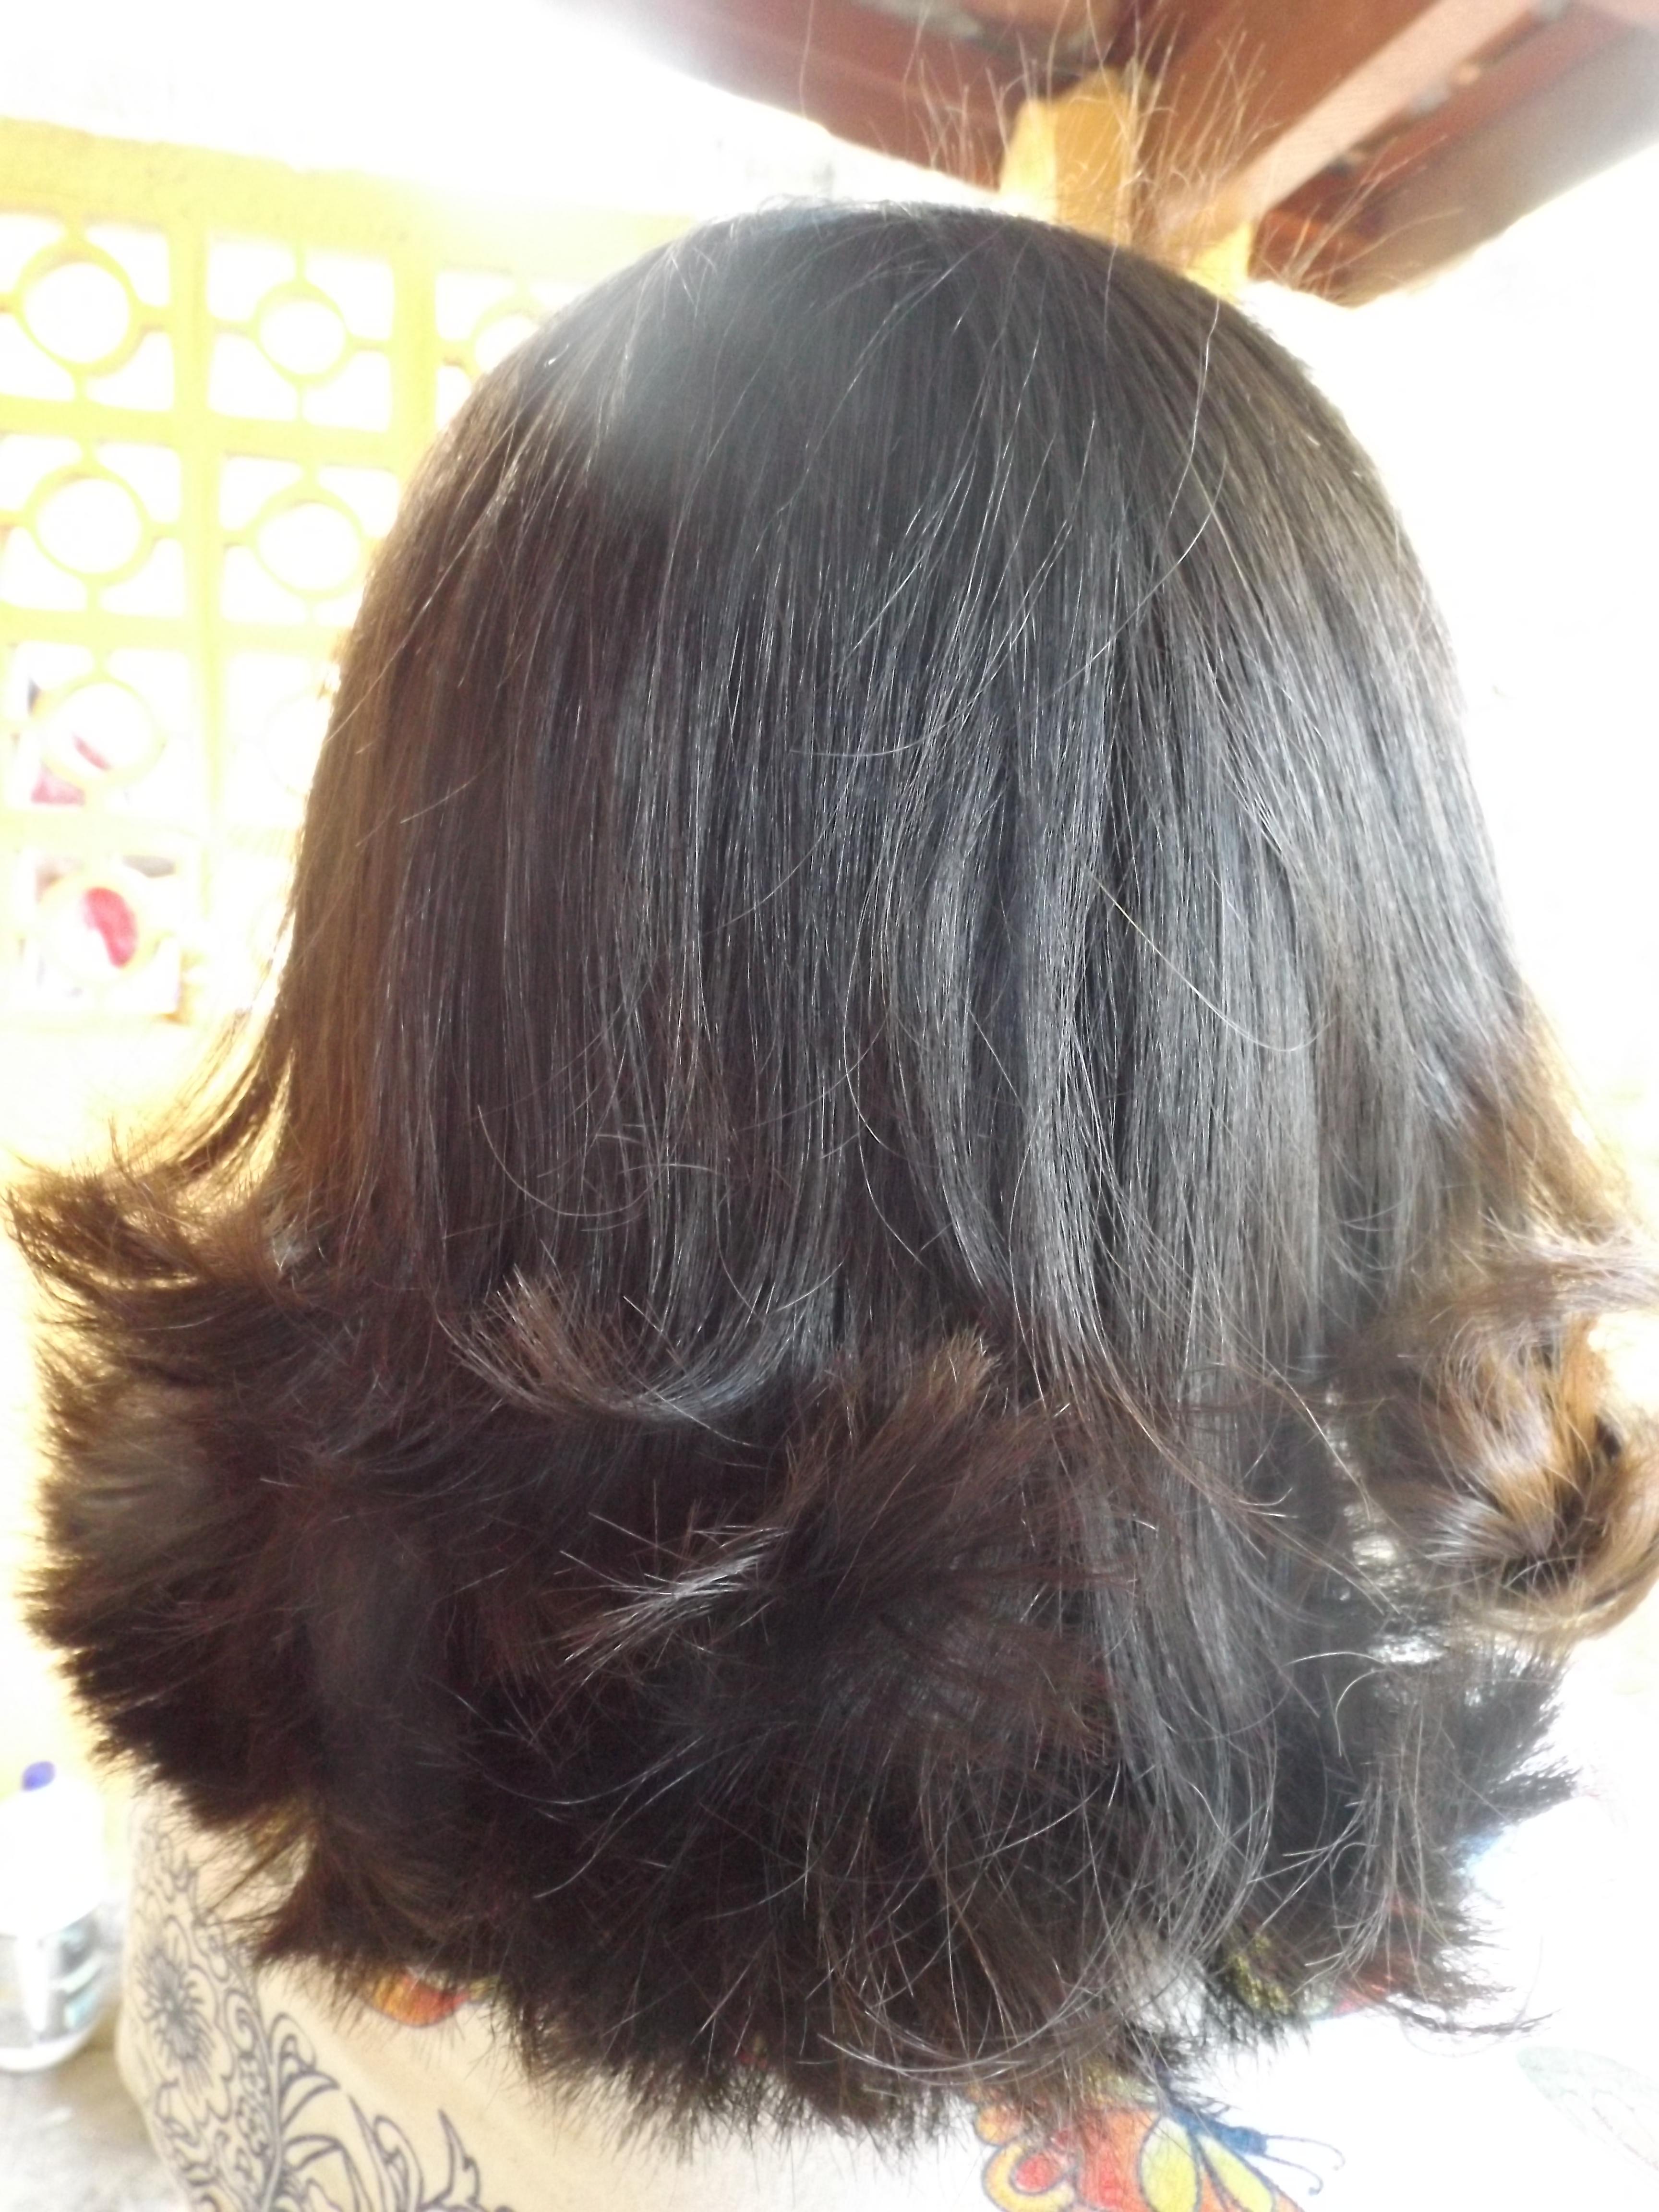 Corte cabeleireiro(a) visagista estudante